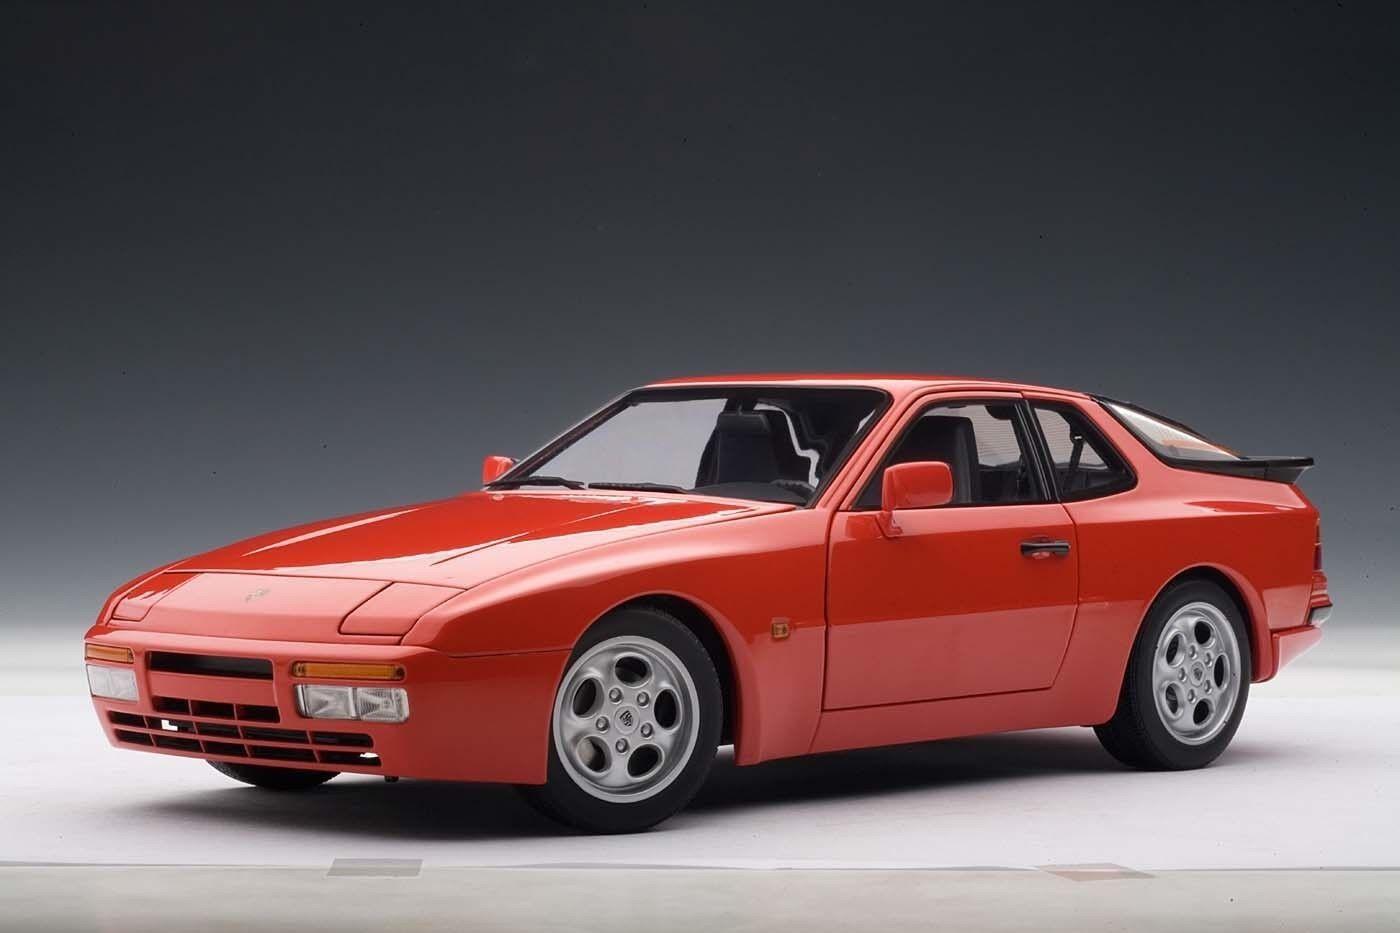 1985 PORSCHE 944 TURBO Guards rouge 1 18 by Autoart  77957 new in box RARE modèle